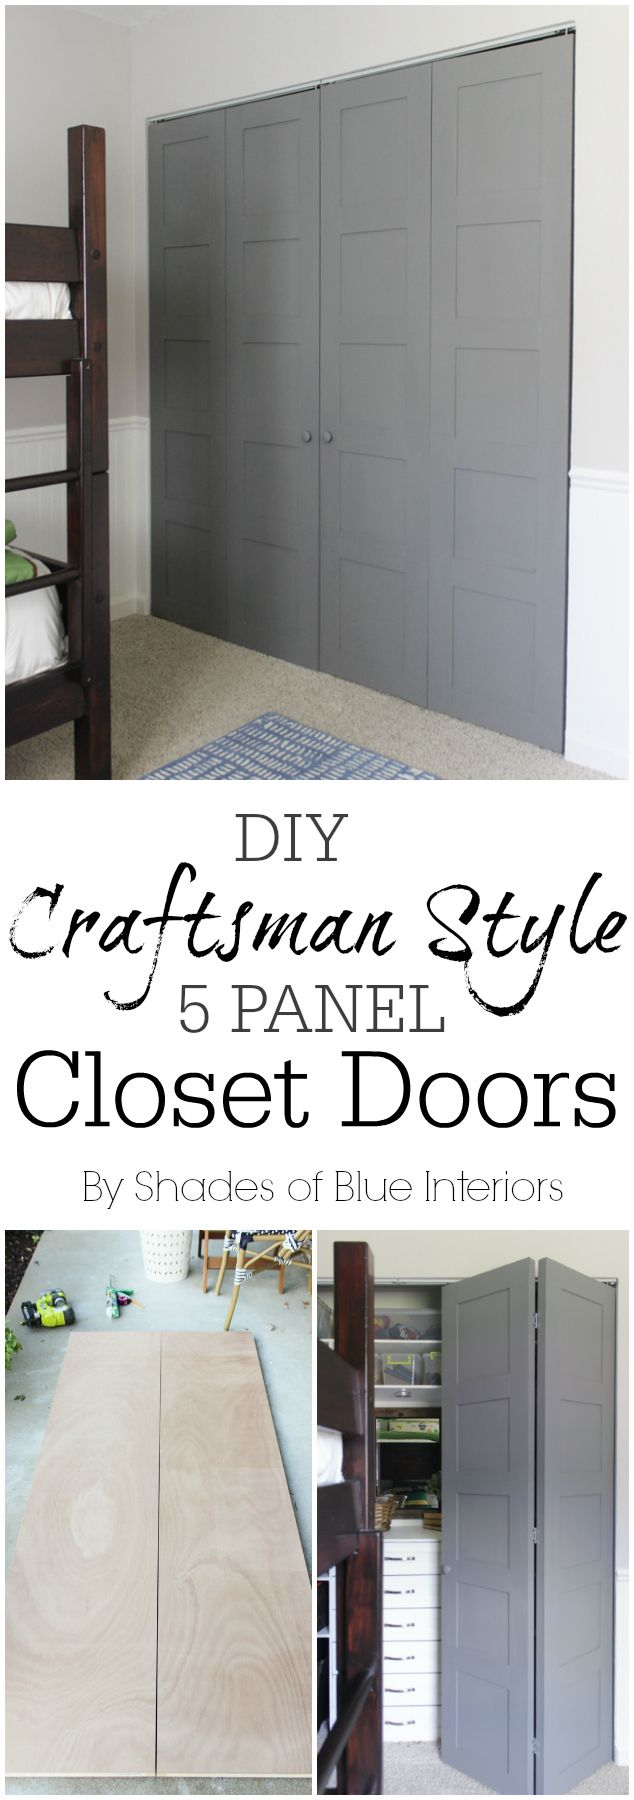 Best 20 Closet Doors Ideas On Pinterest Closet Ideas